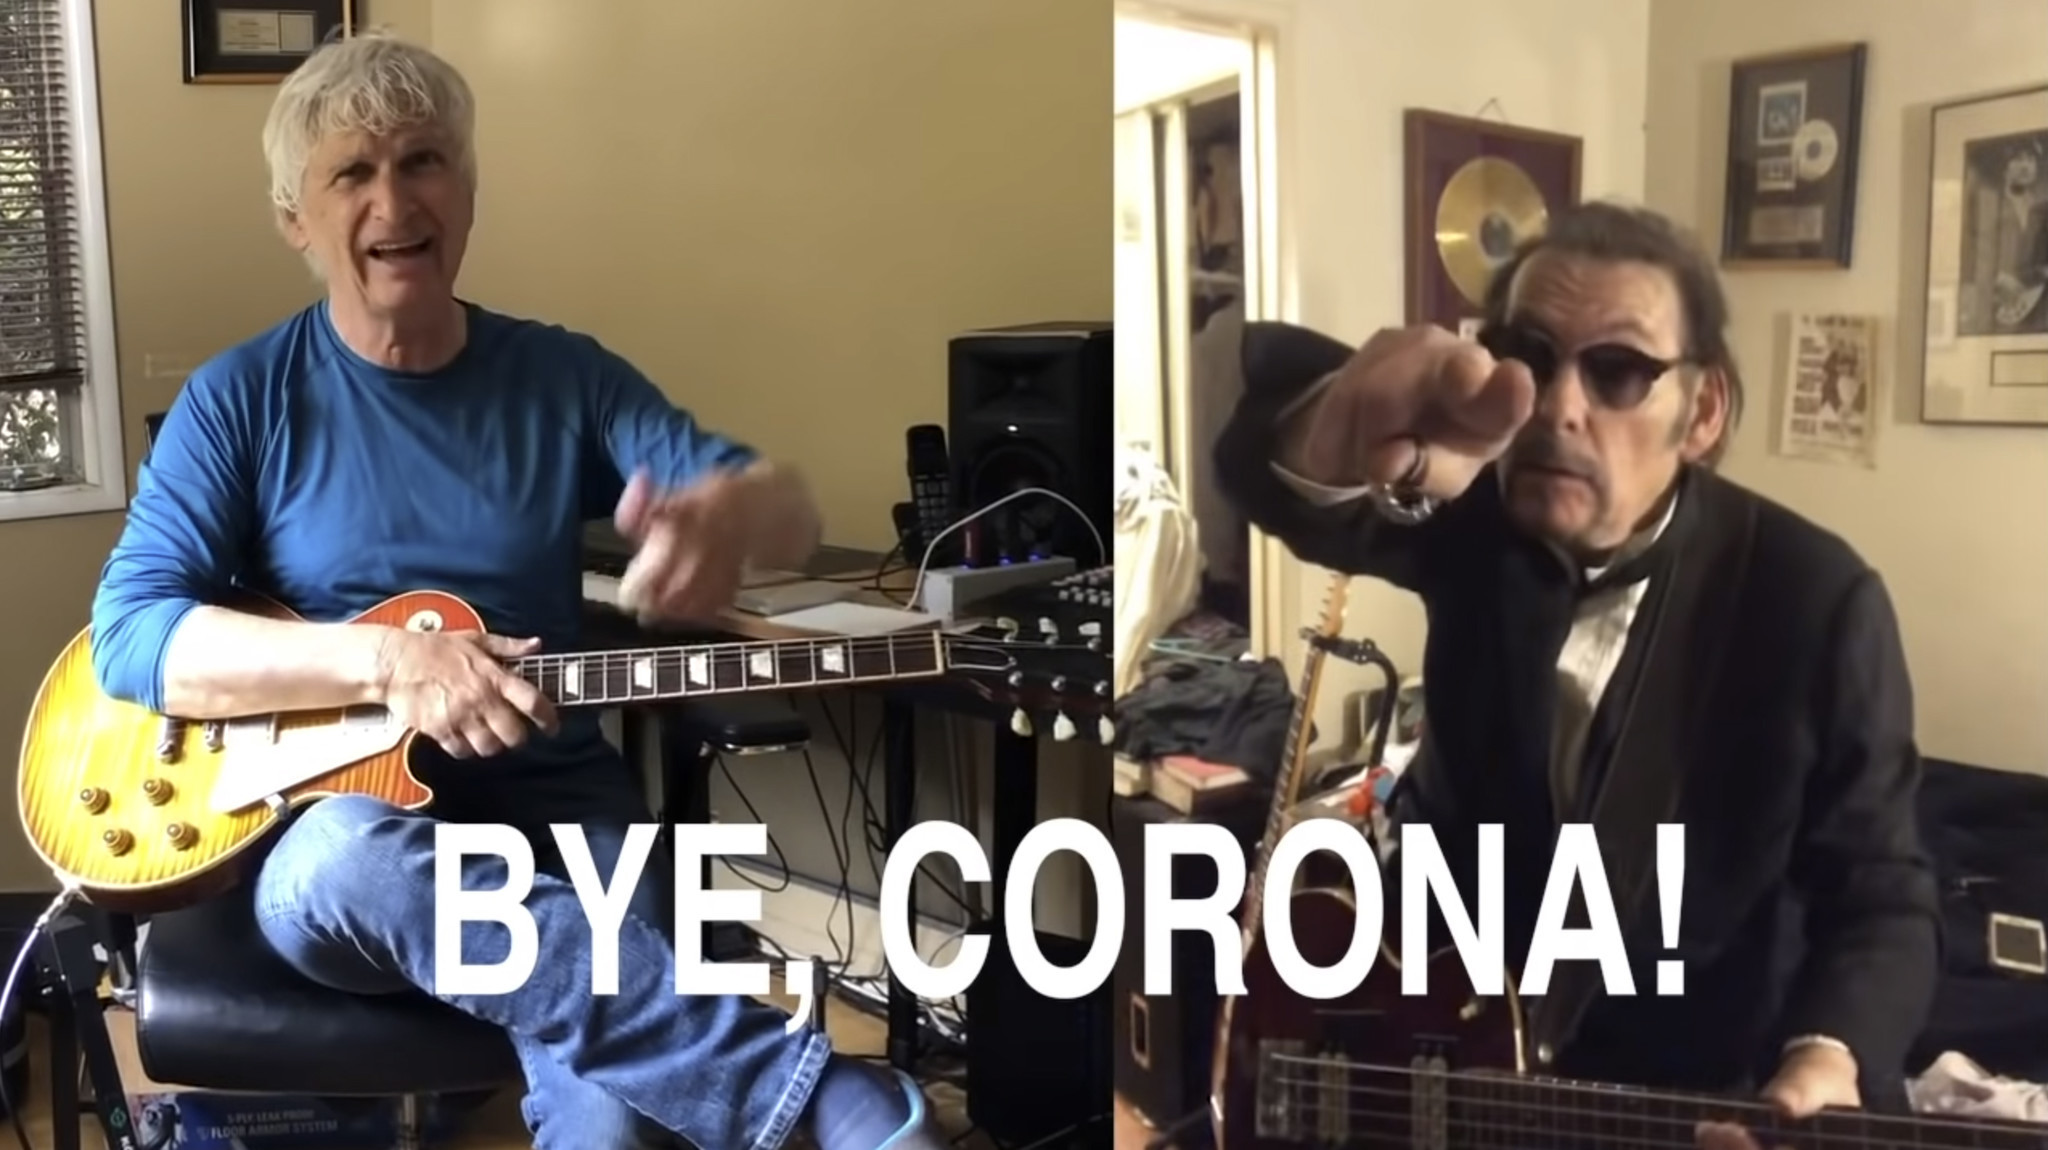 The Knack made a 'My Sharona' parody about coronavirus